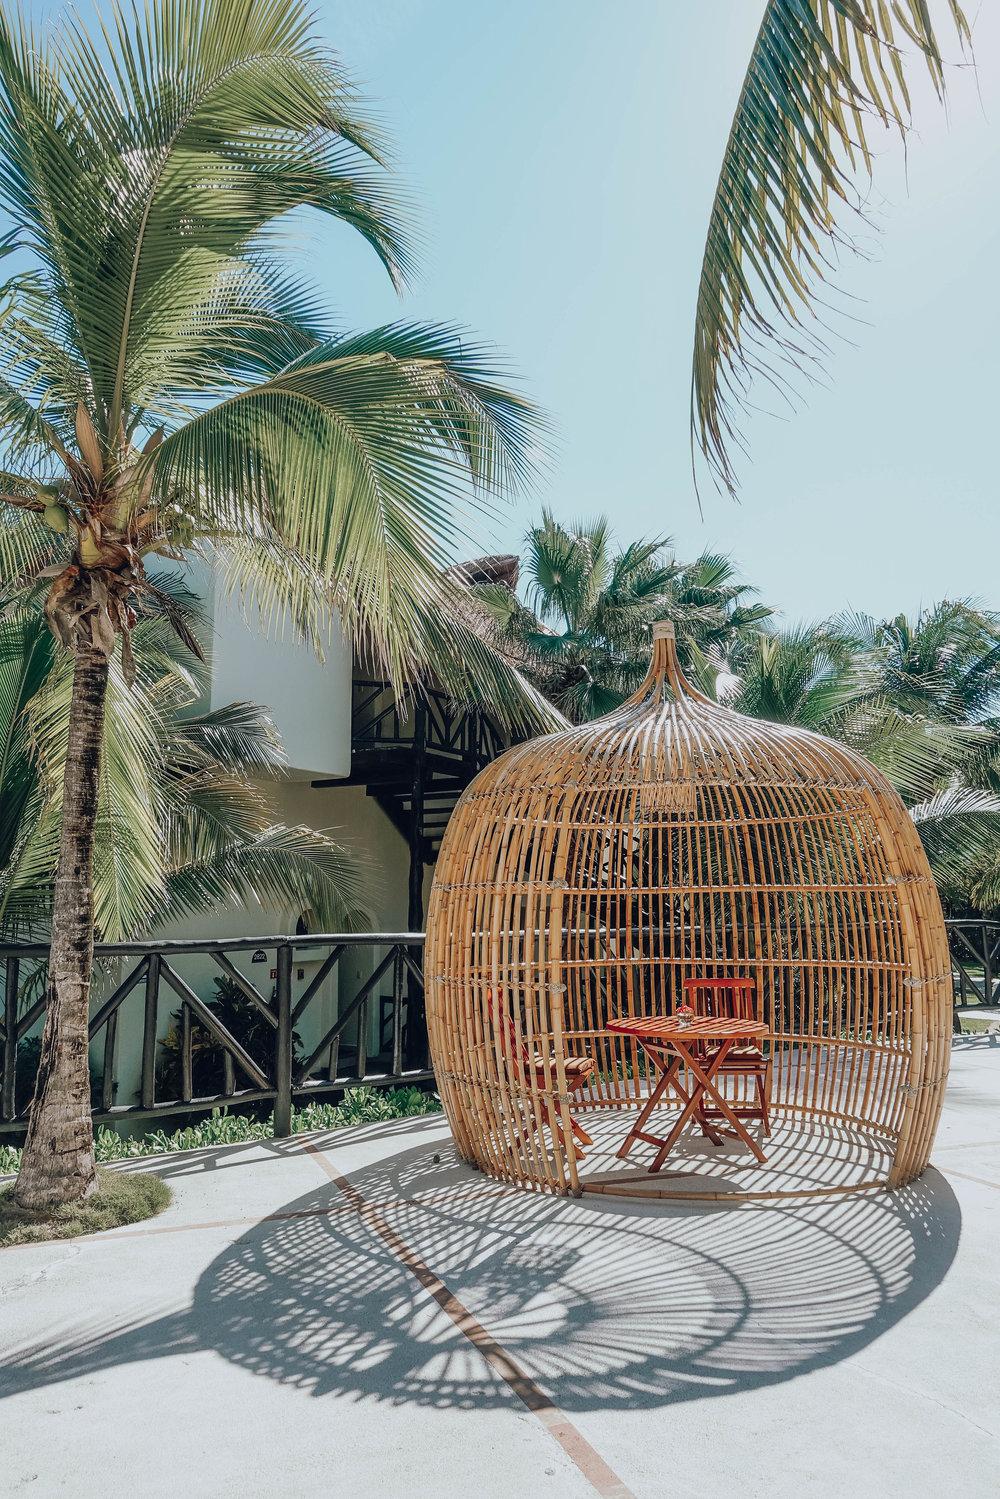 Karisma Hotel El Dorado Casita Royale FashionbyAlly Blog